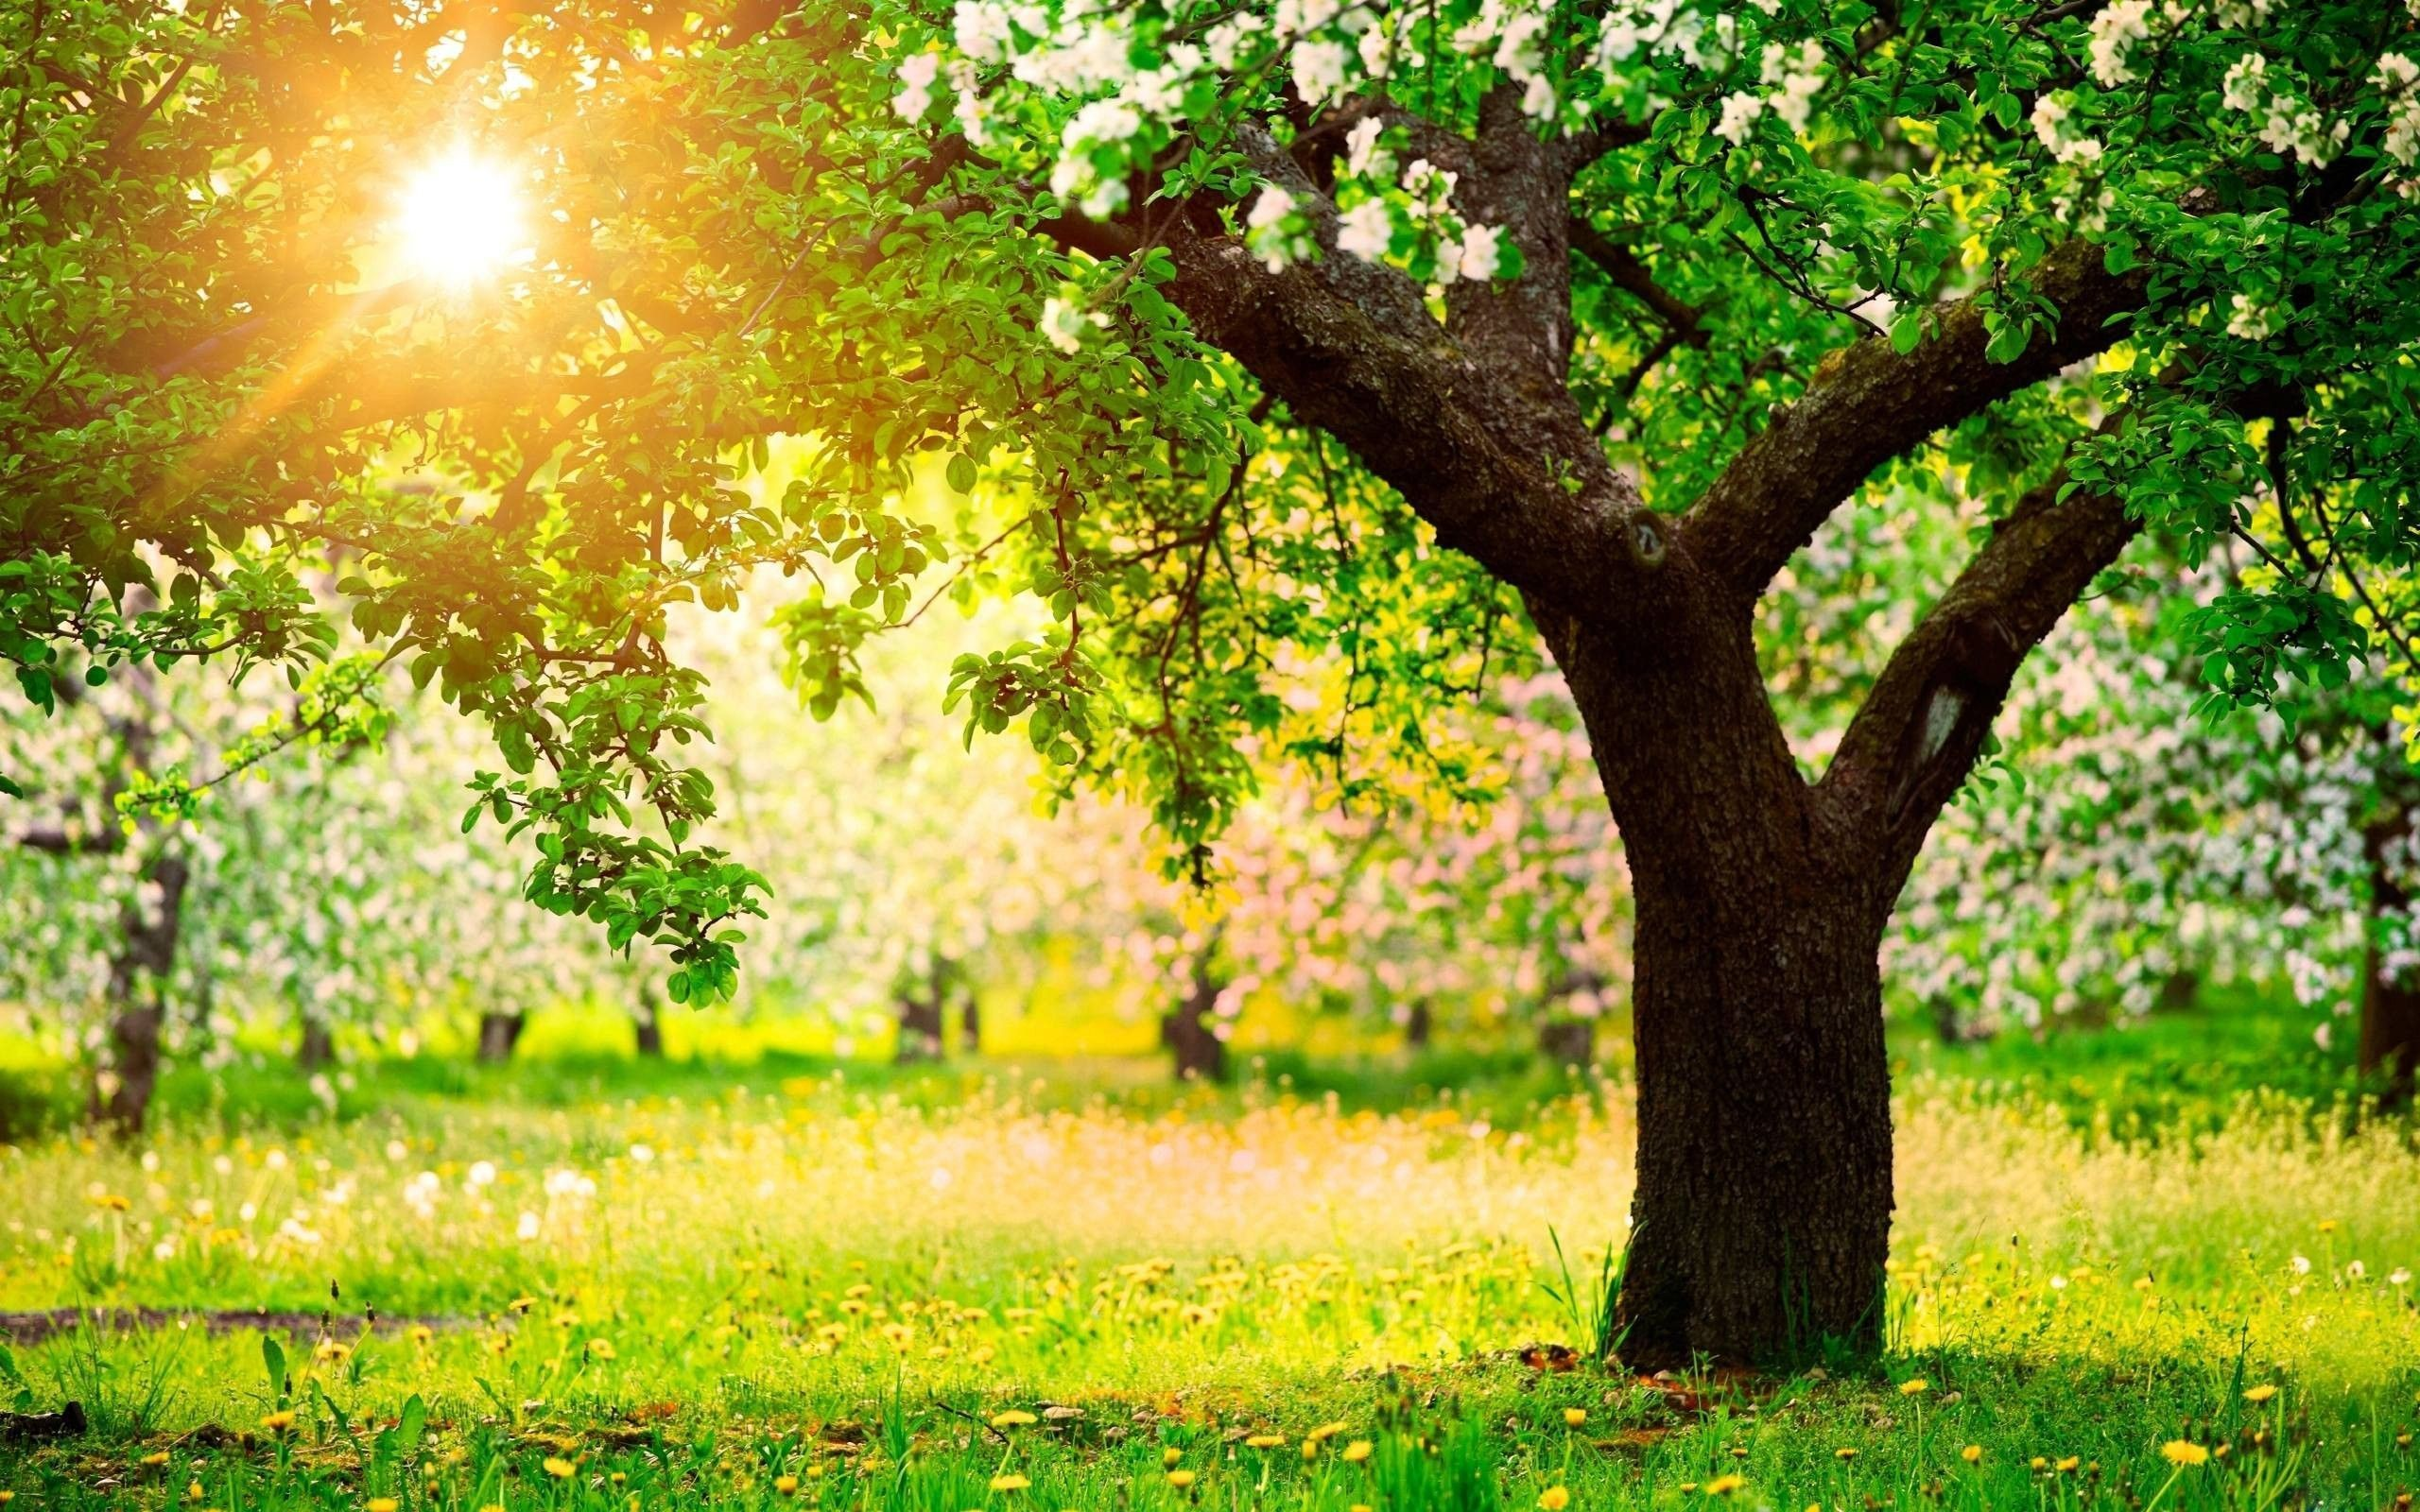 Beautiful Spring Nature HD Wallpapers